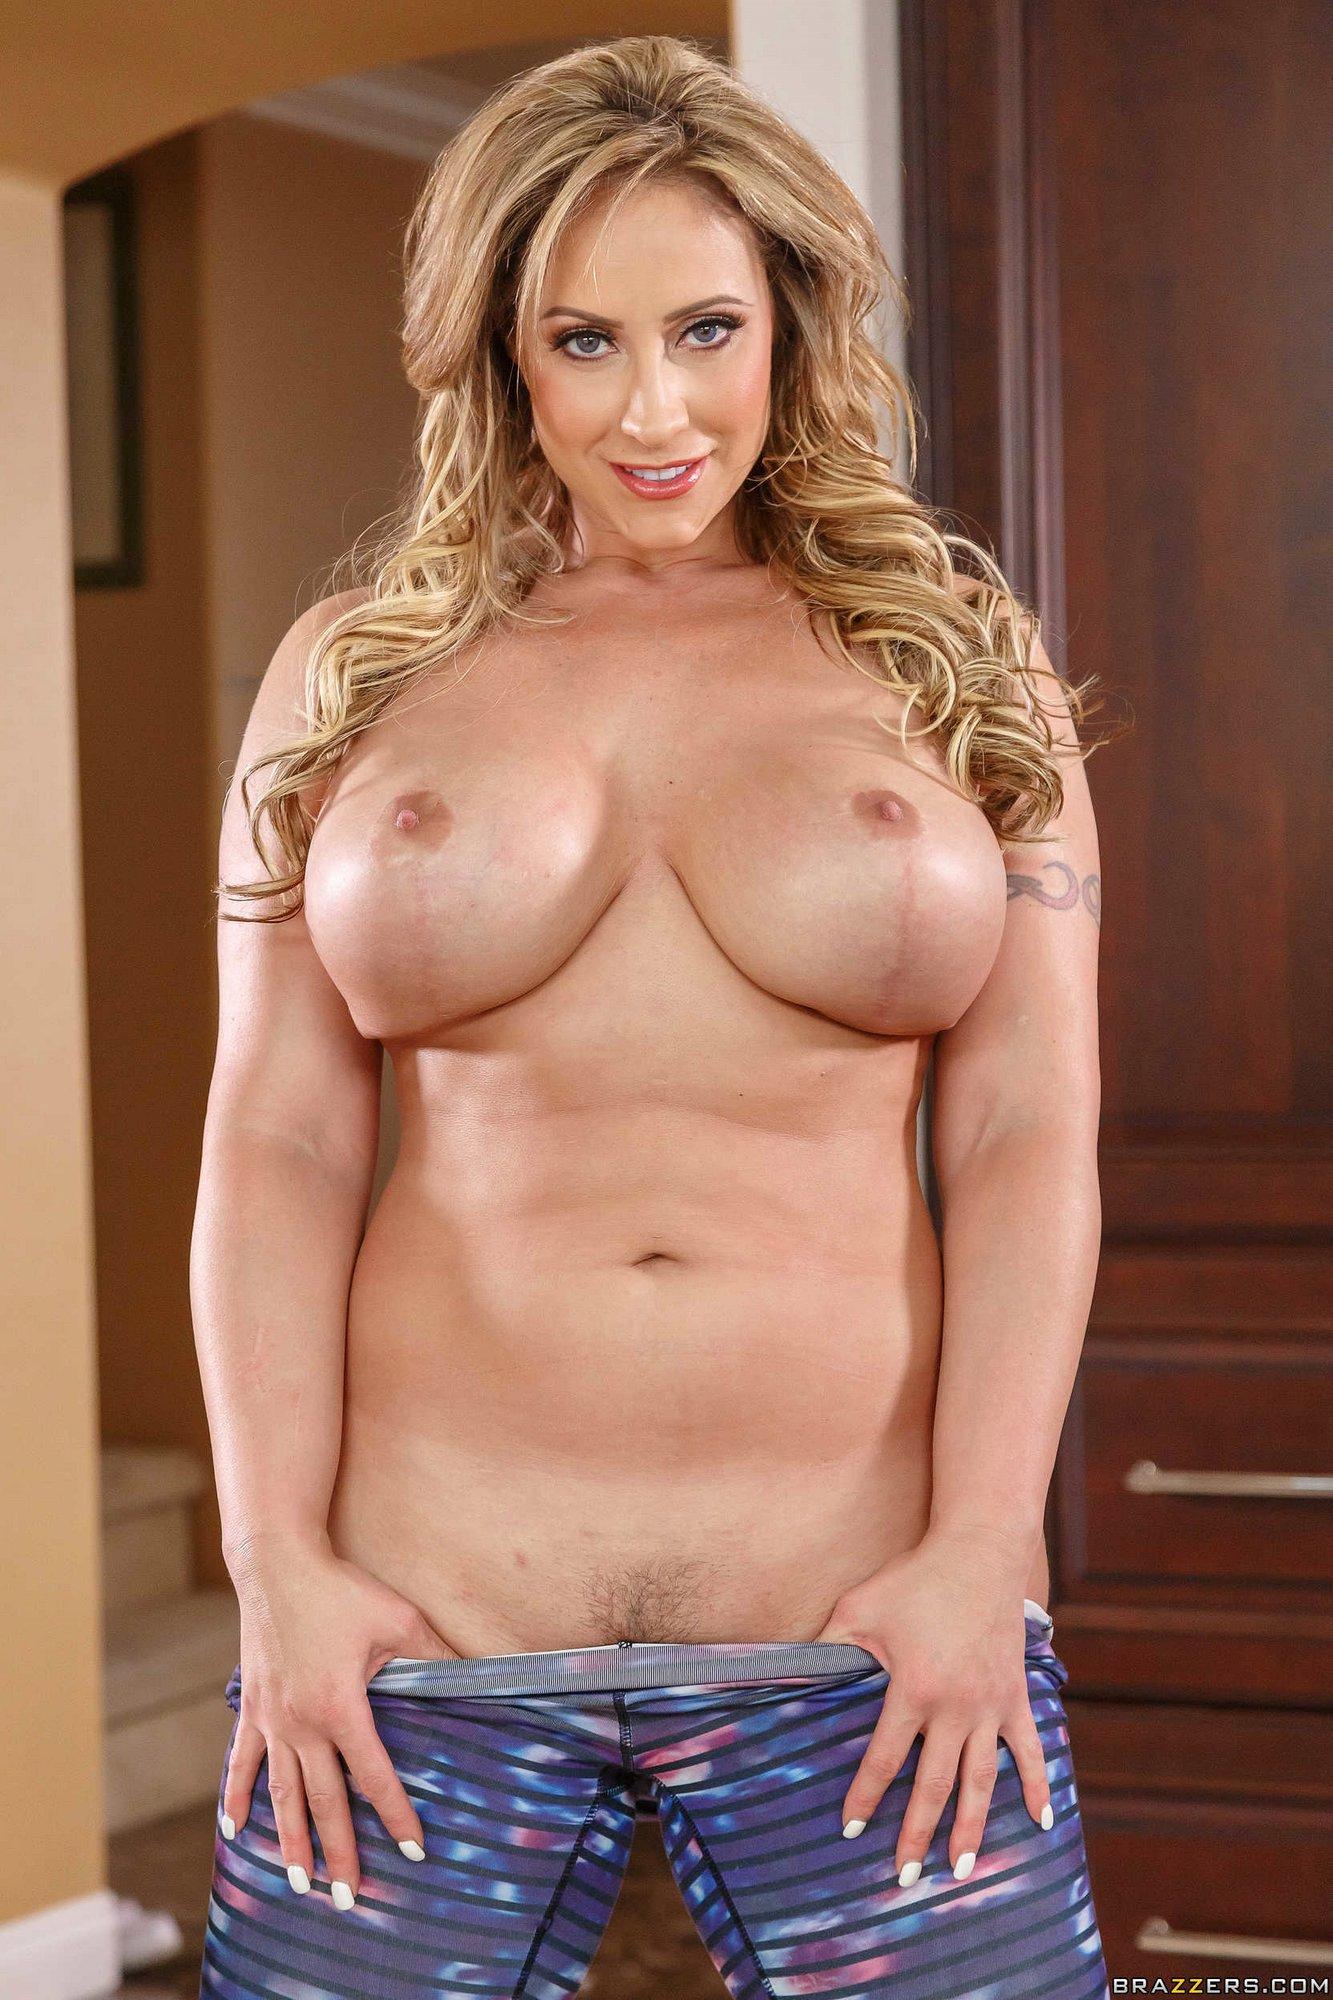 Gorgeous Blonde Milf Eva Notty Posing Naked For Camera -2411